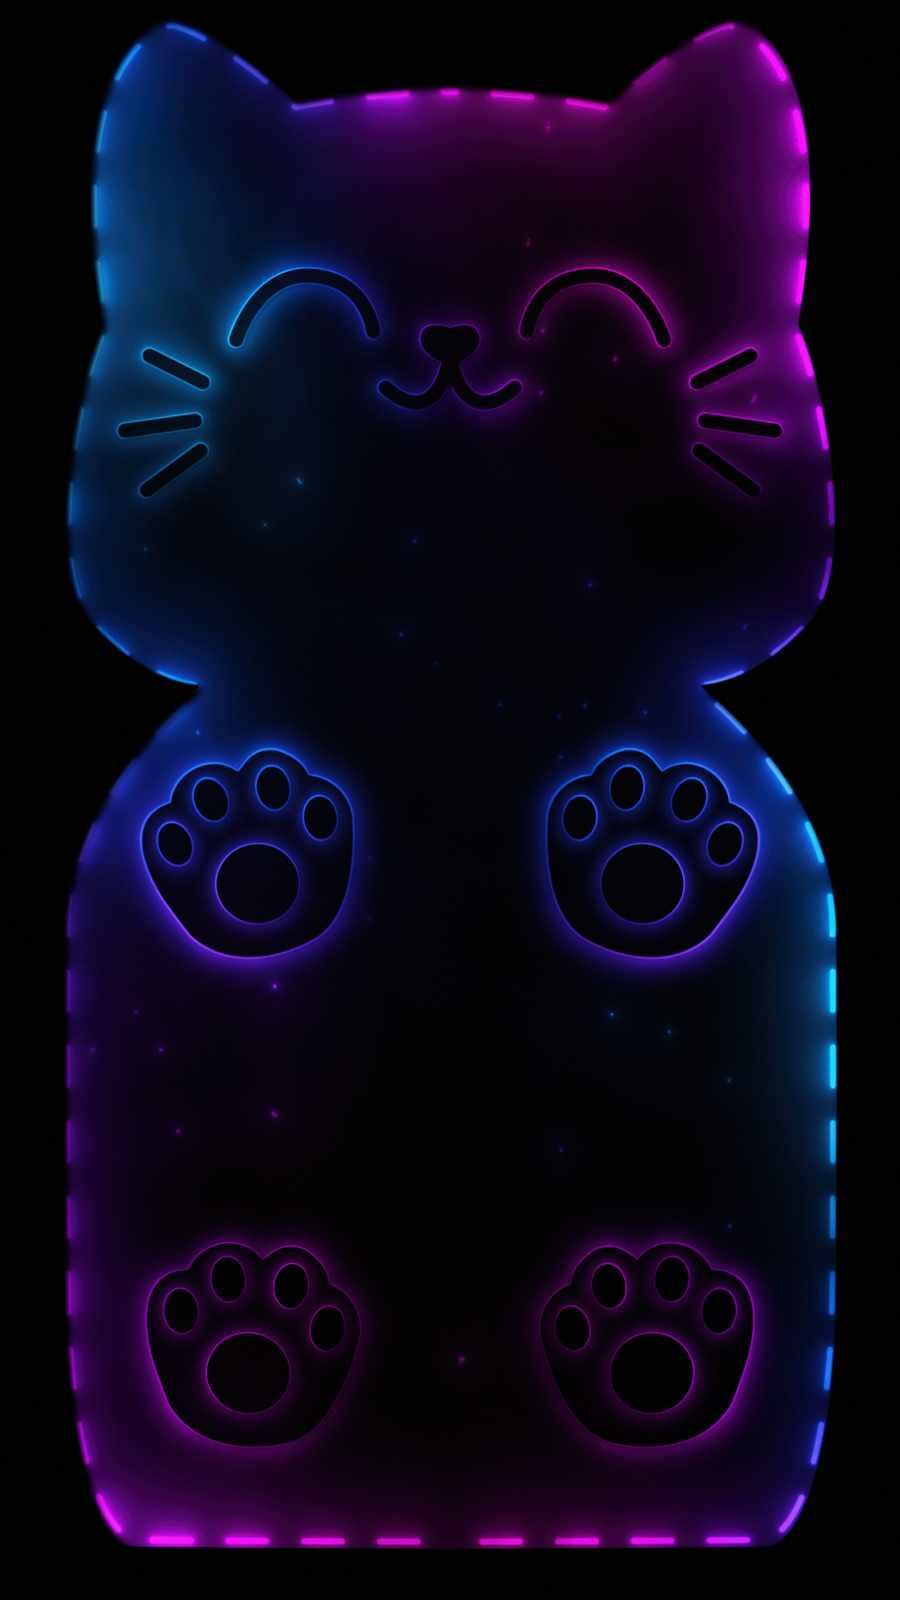 Cat Phone iPhone Wallpaper